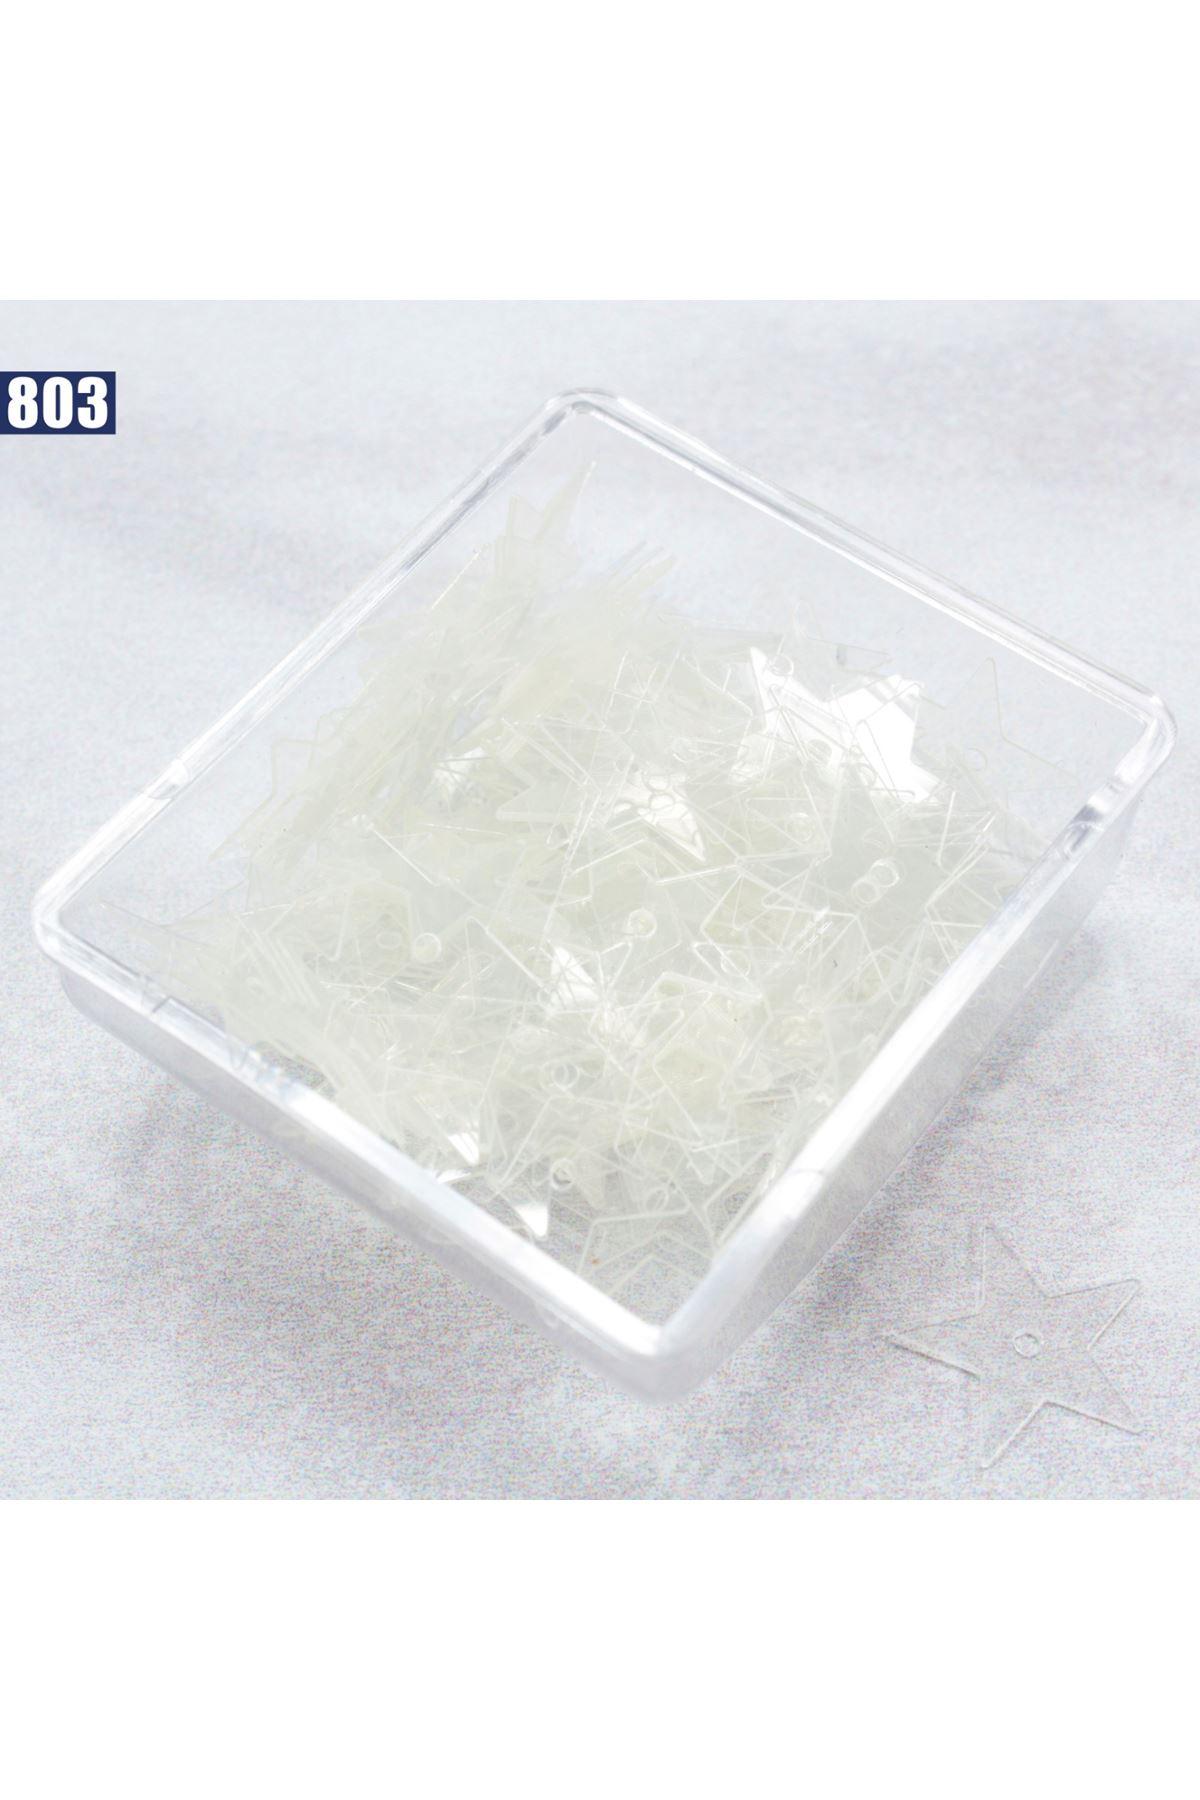 Pul 10 gram - 803